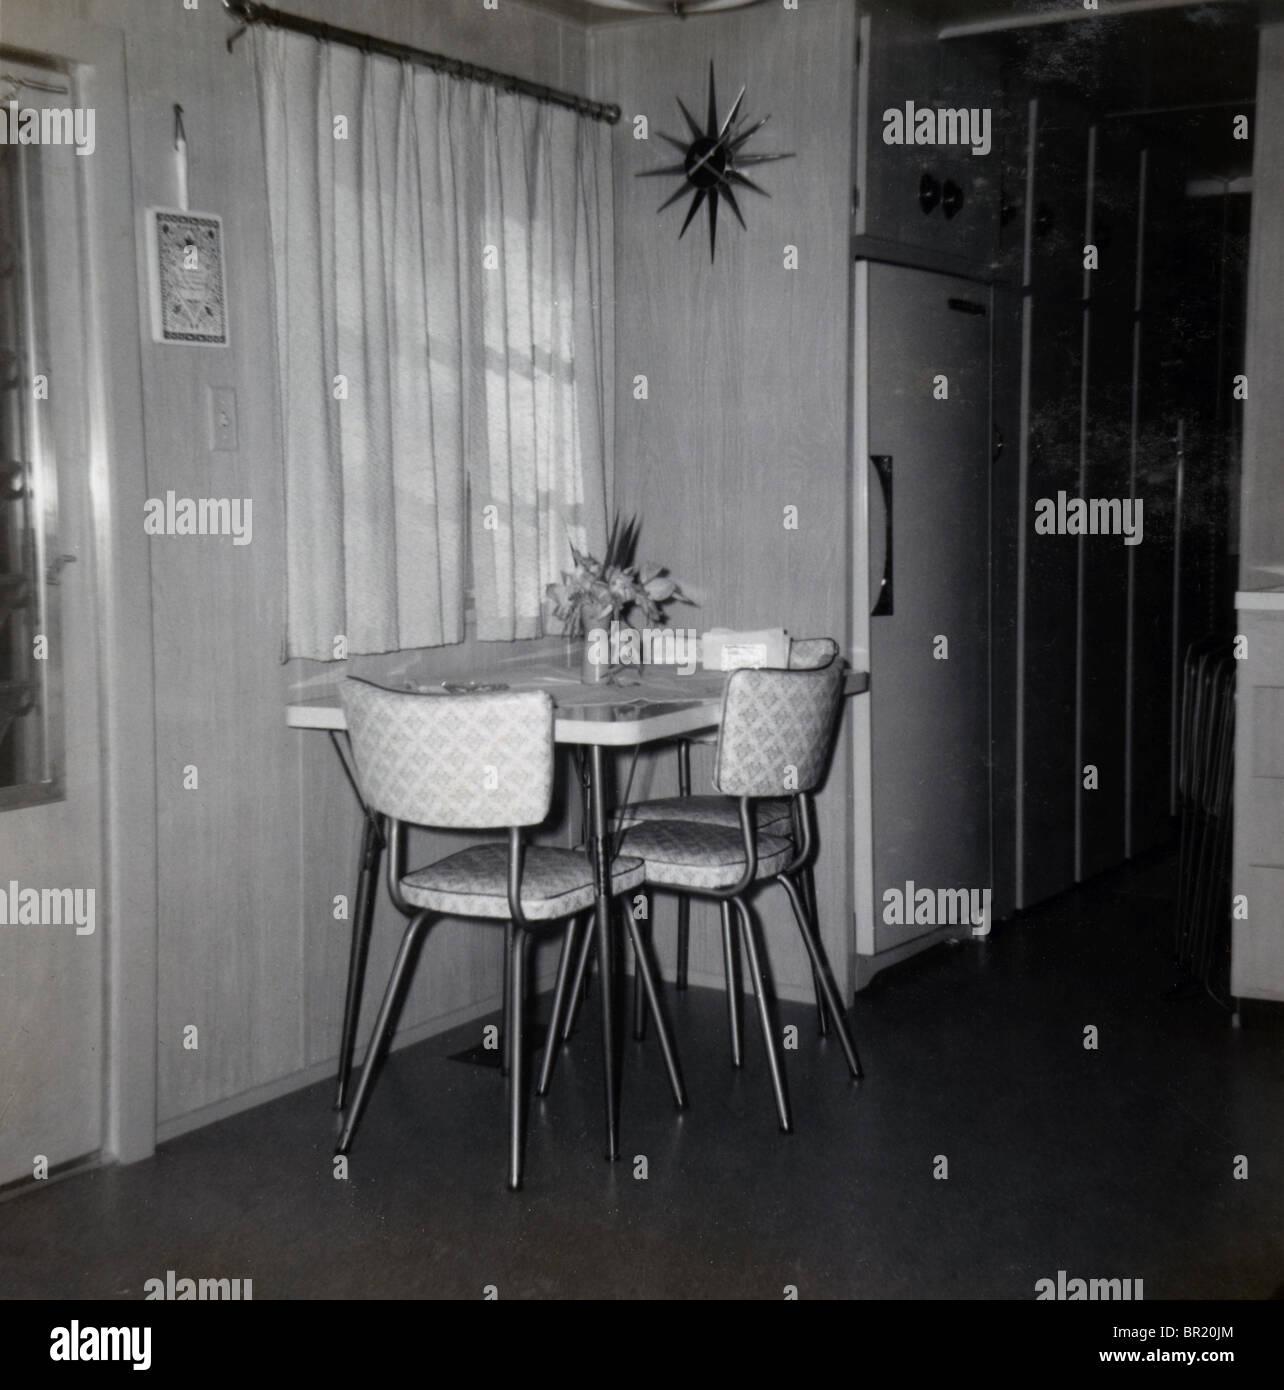 Vintage Kitchen Photography: 1960's Kitchen Stock Photos & 1960's Kitchen Stock Images